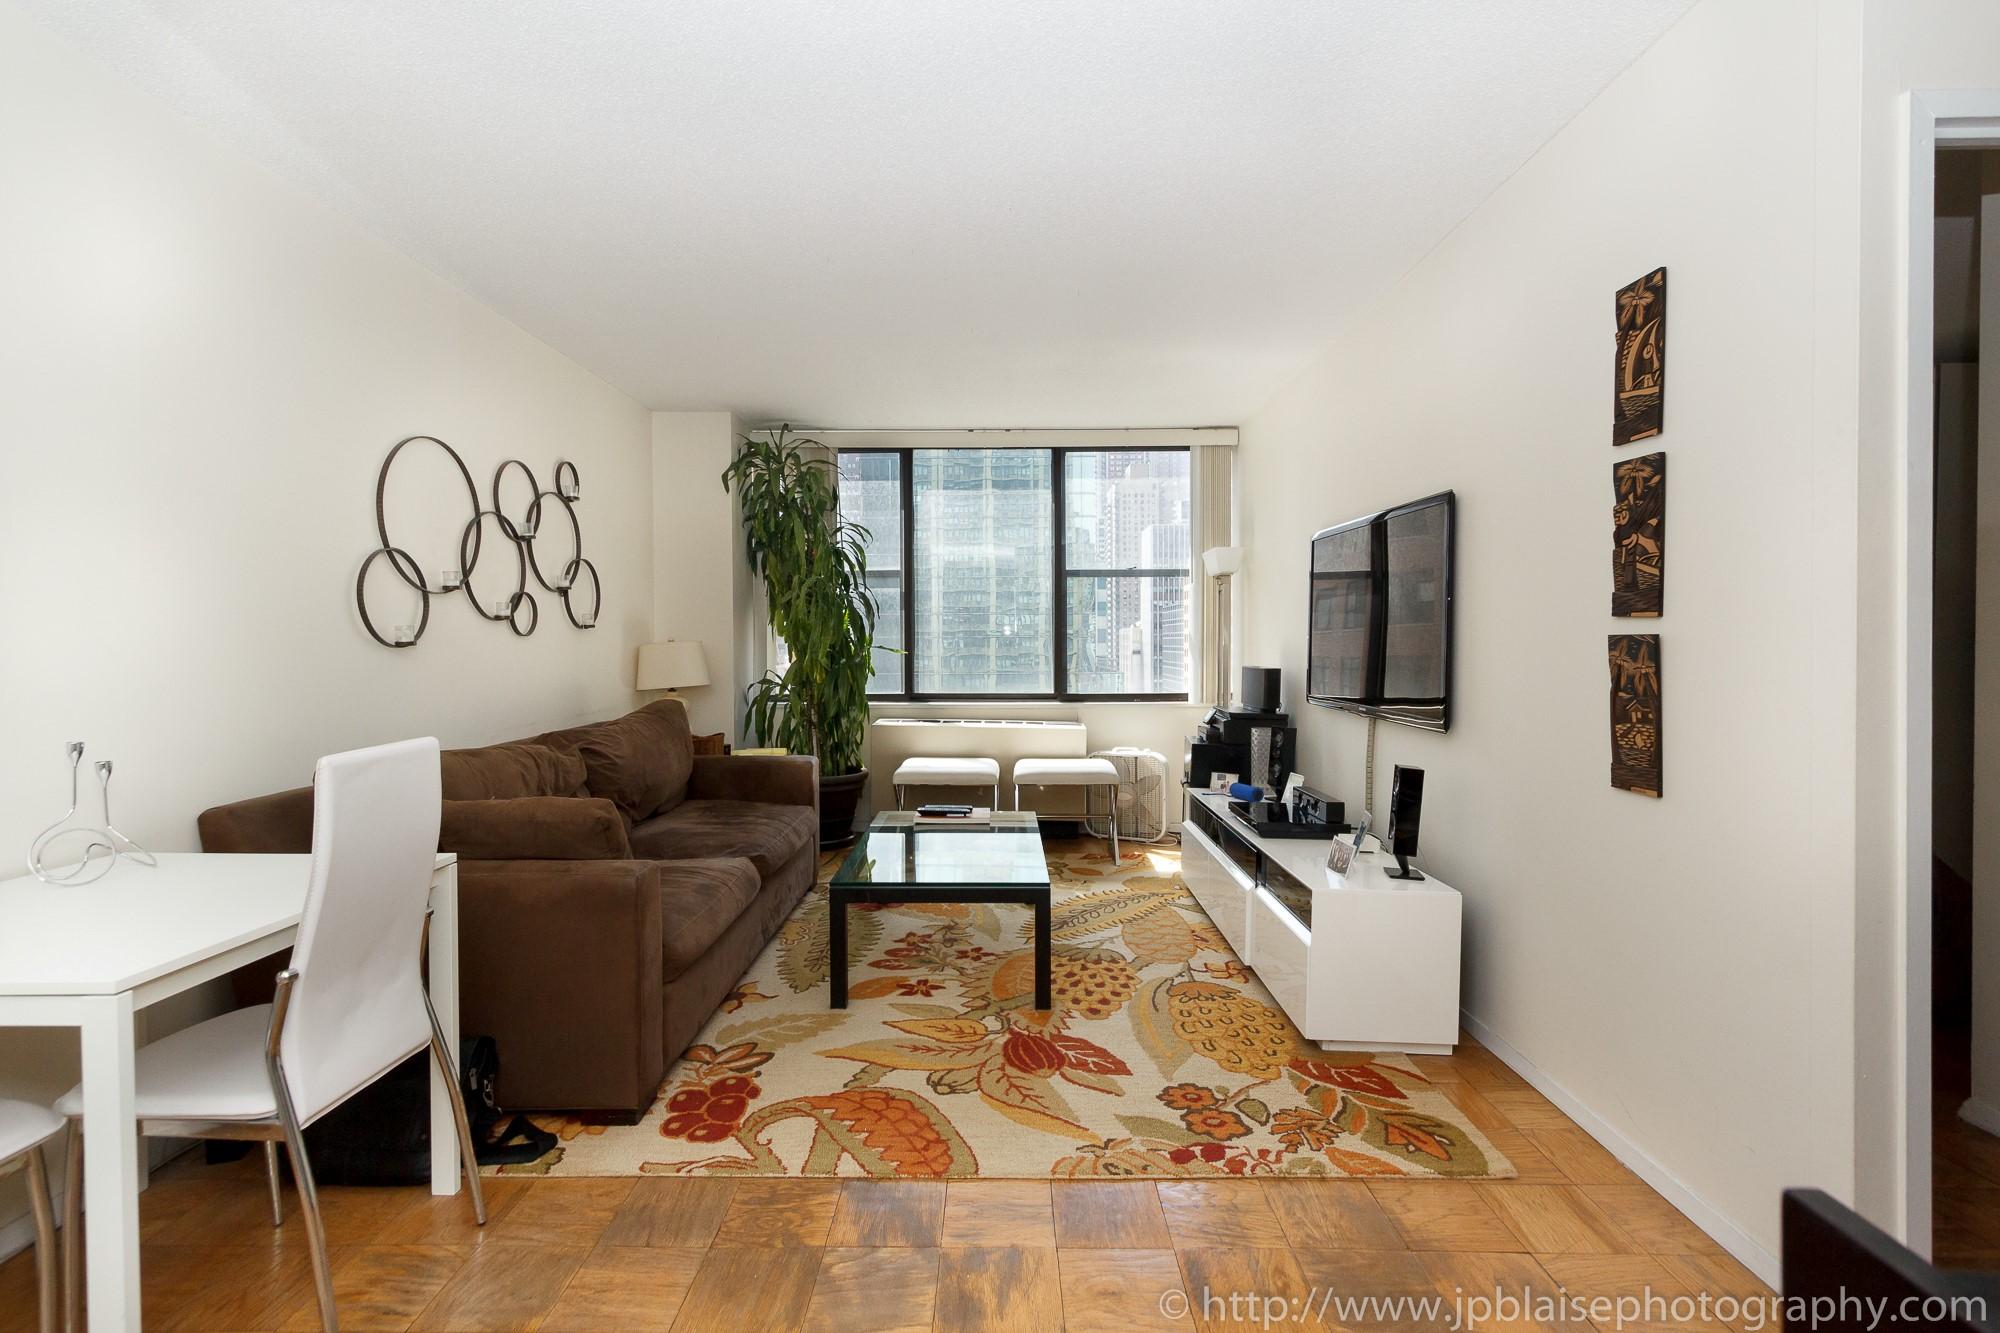 New York City Apartment Photographer diaries: One bedroom ...